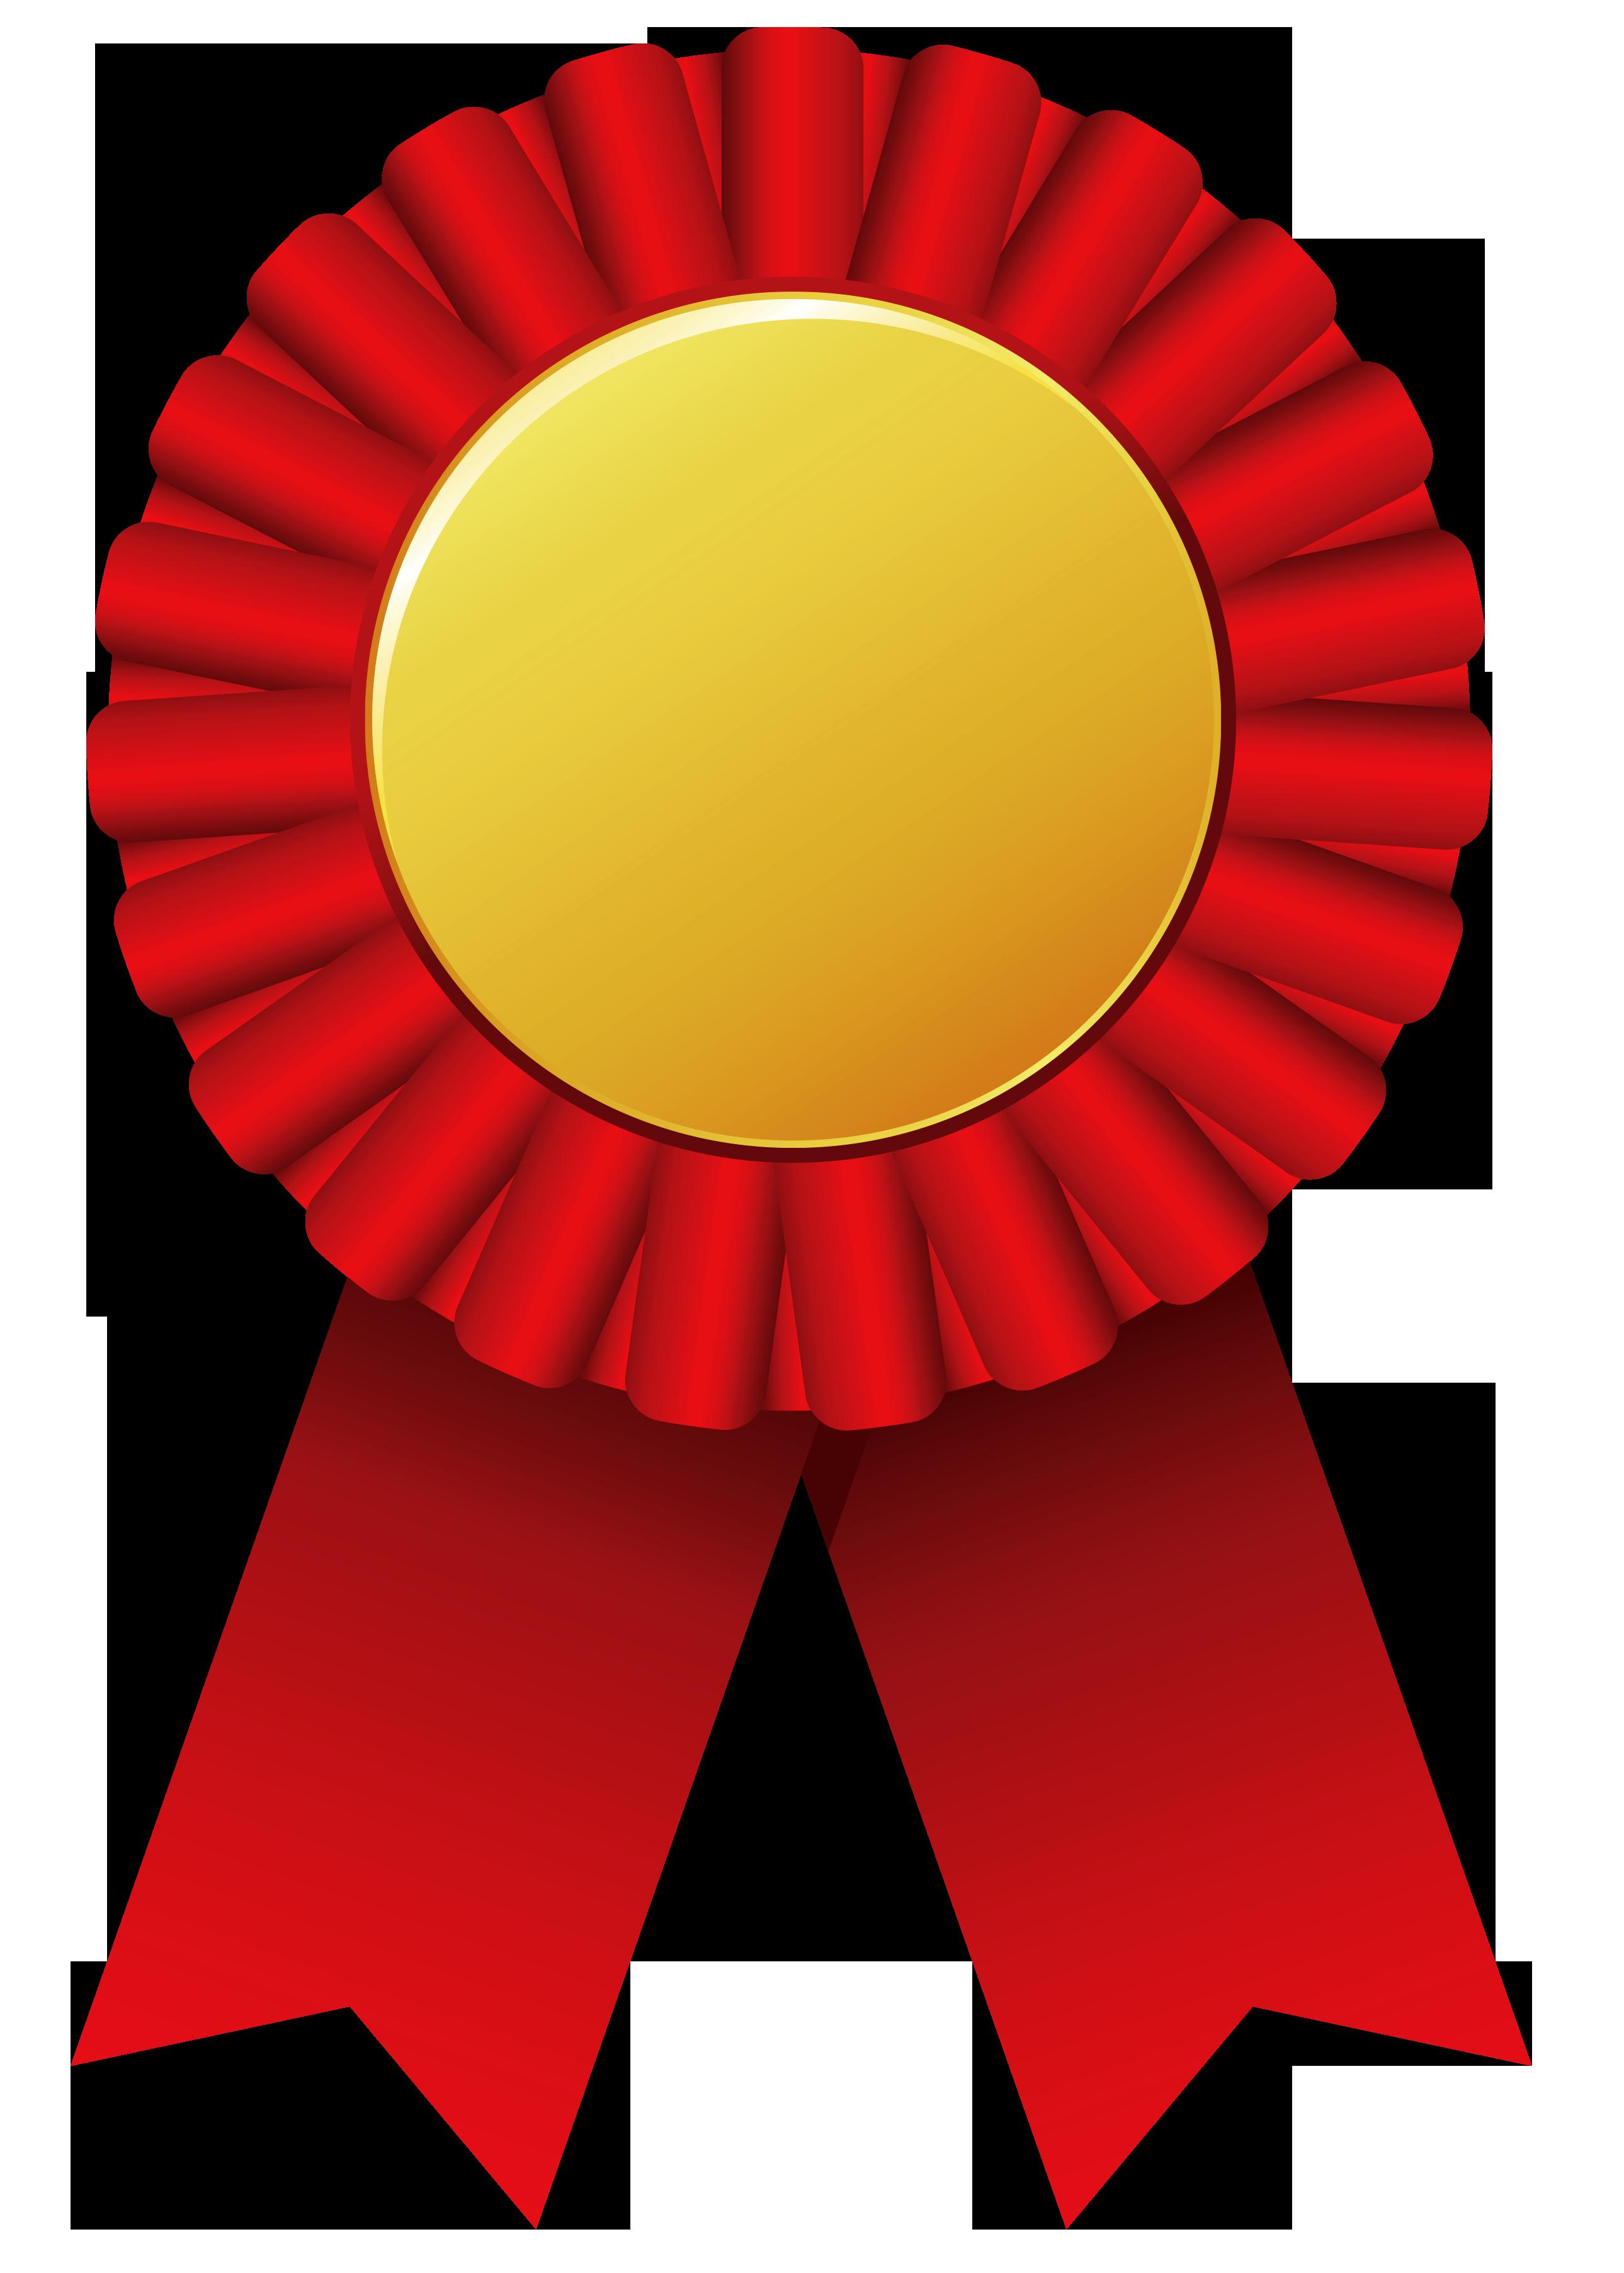 Circle clipart ribbon. Red rosette png clipar